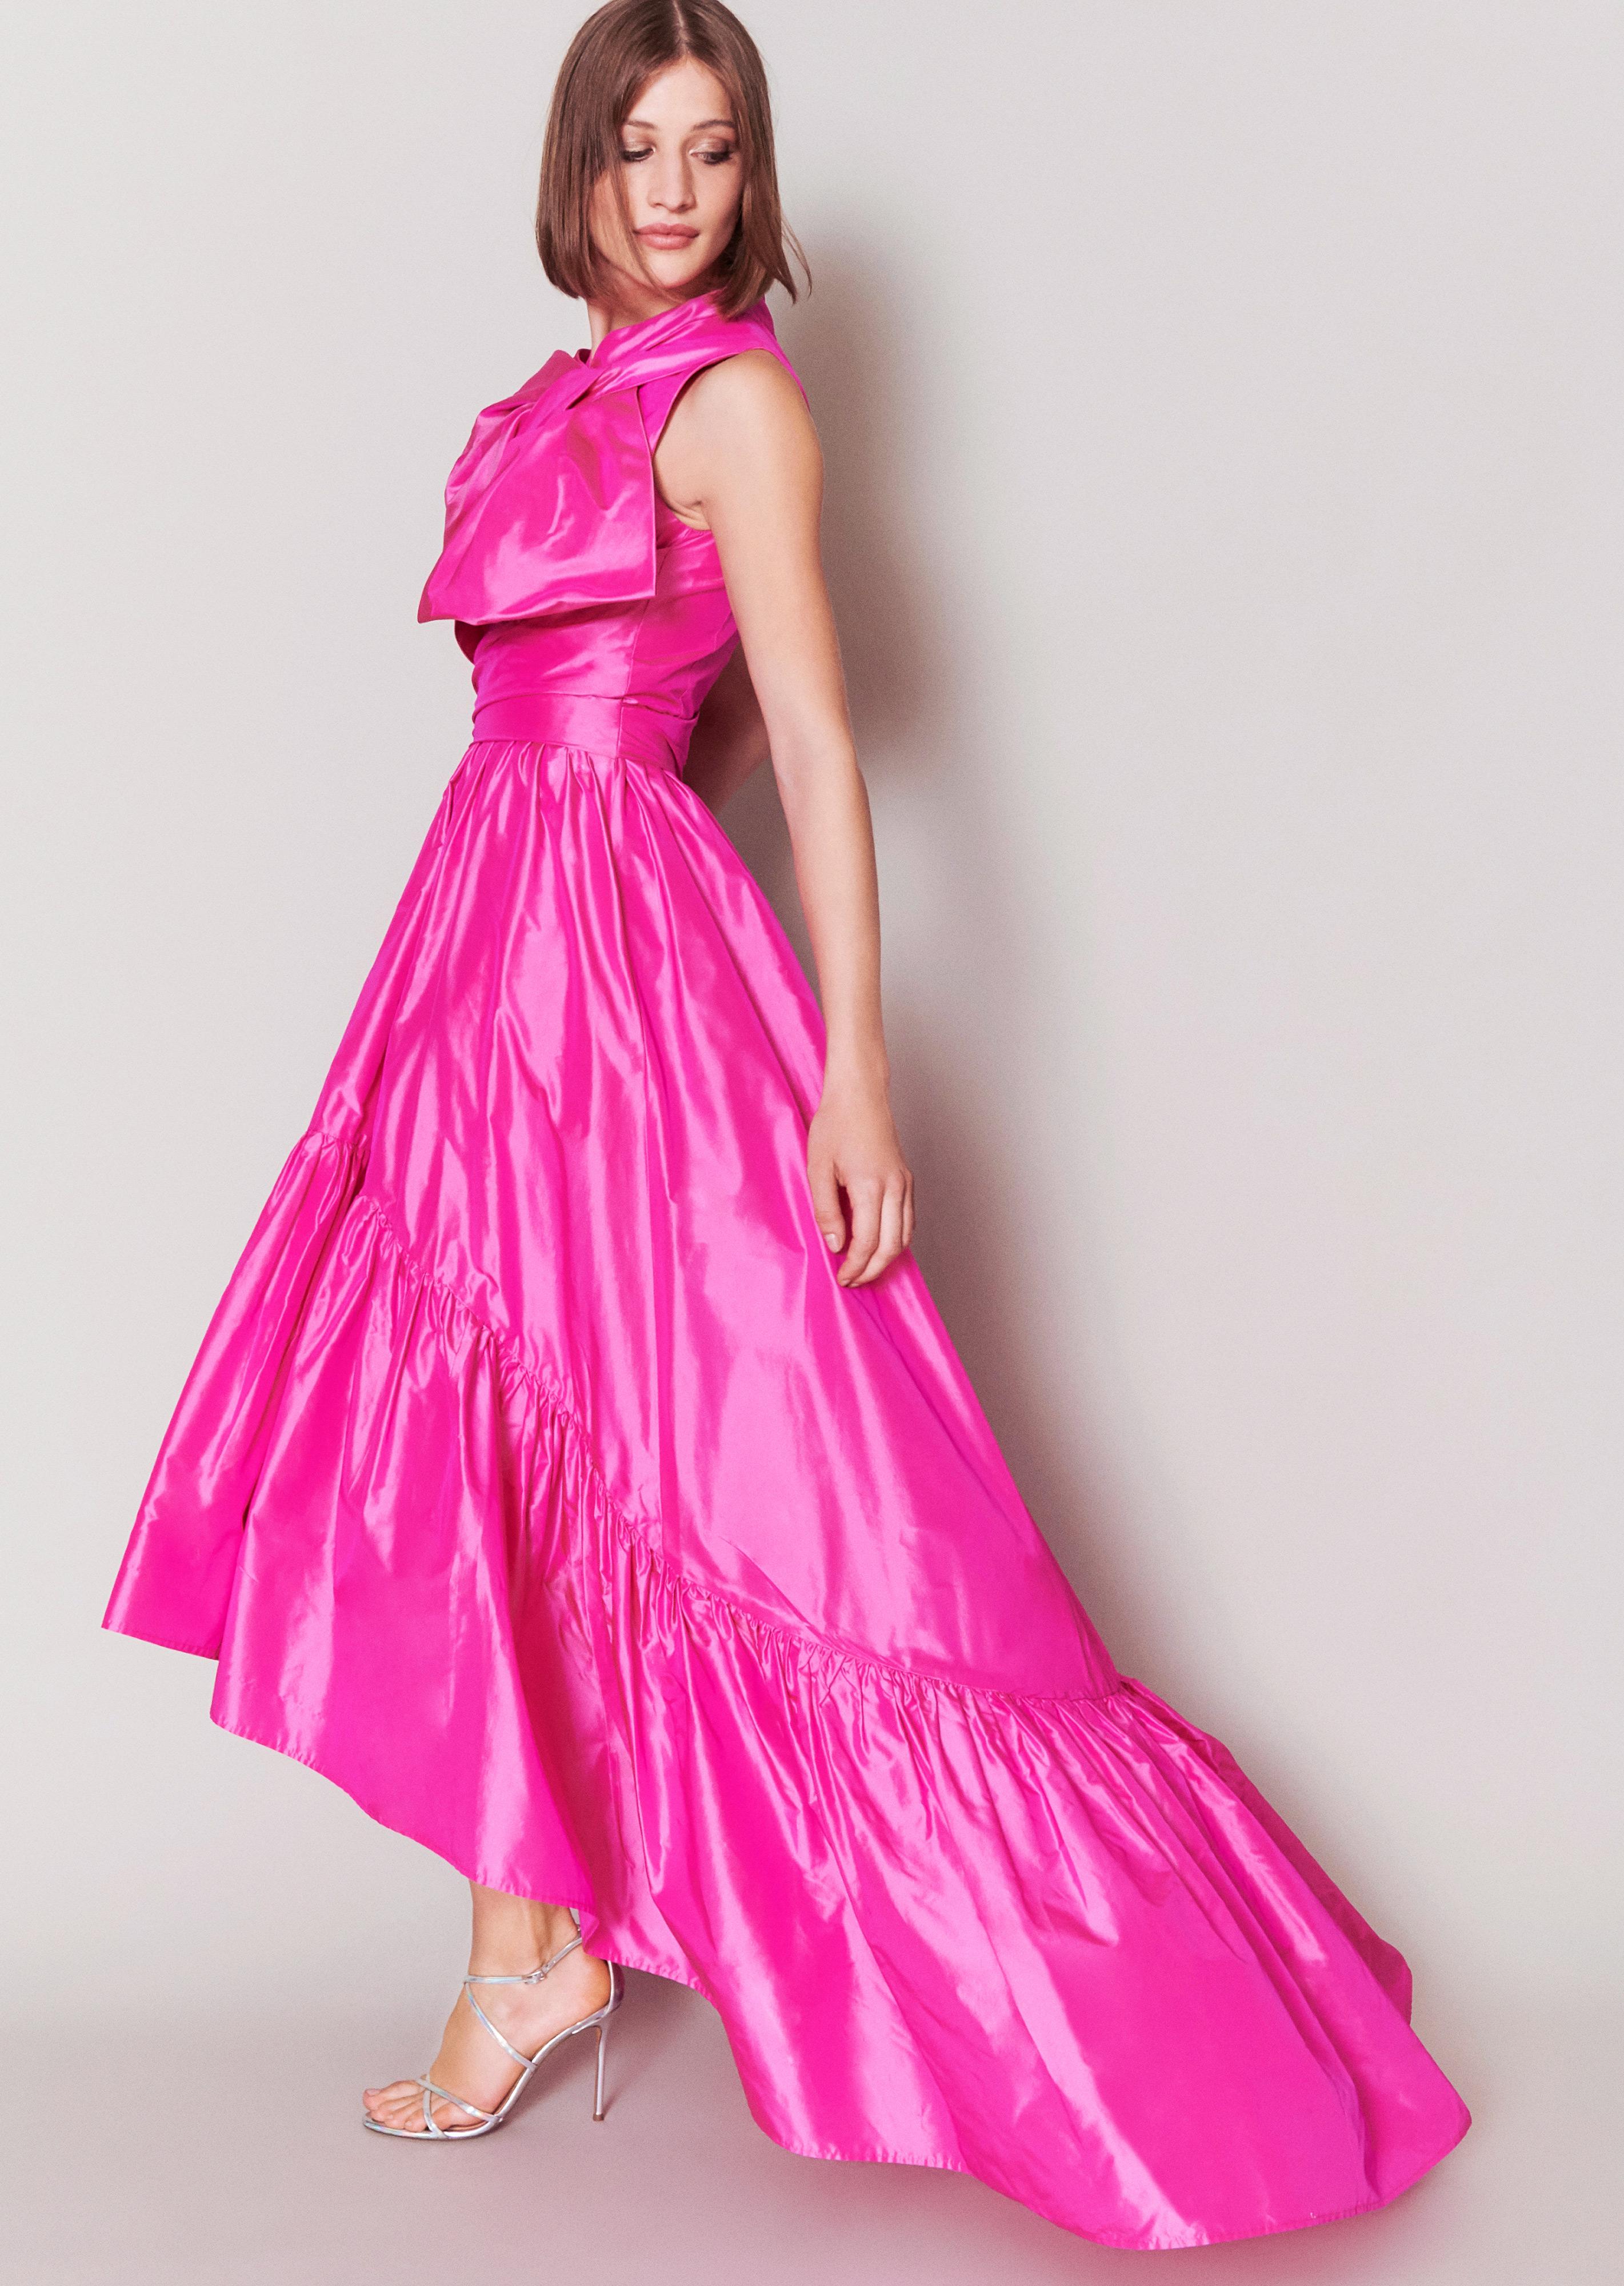 Abendkleid Toucan1 l Designer-Abendkleider l Talbot Runhof ...